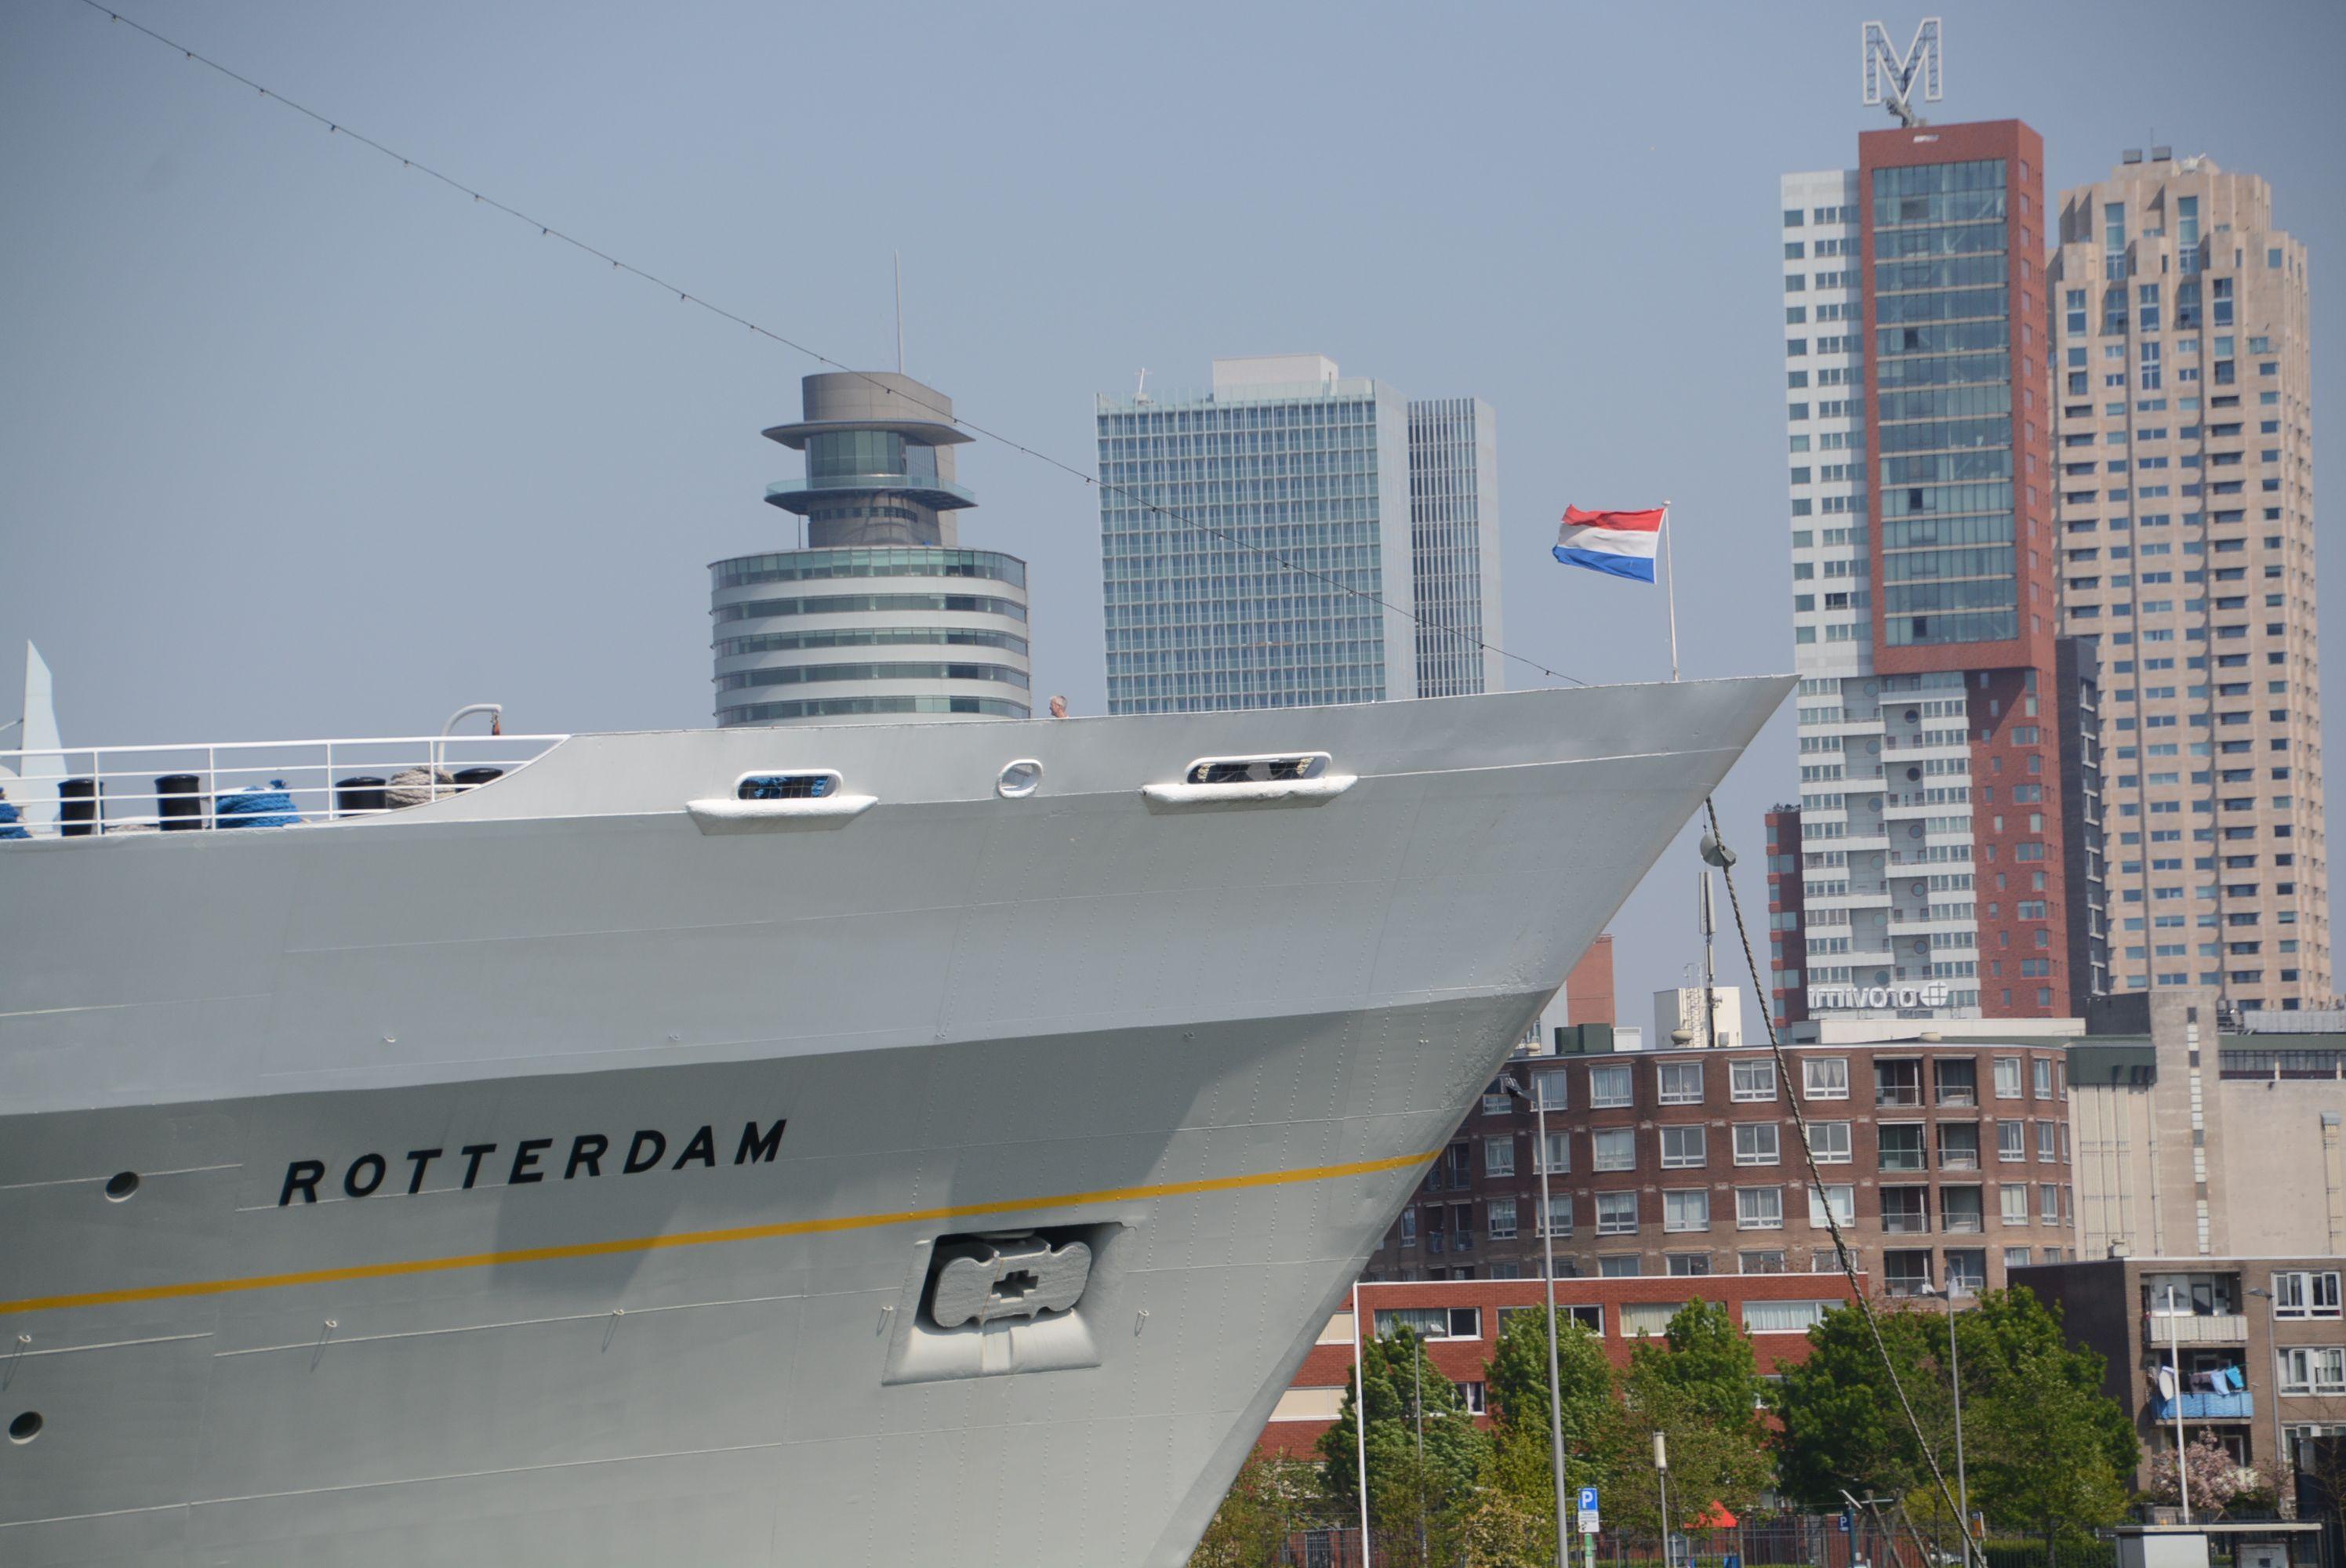 SS Rotterdam x5